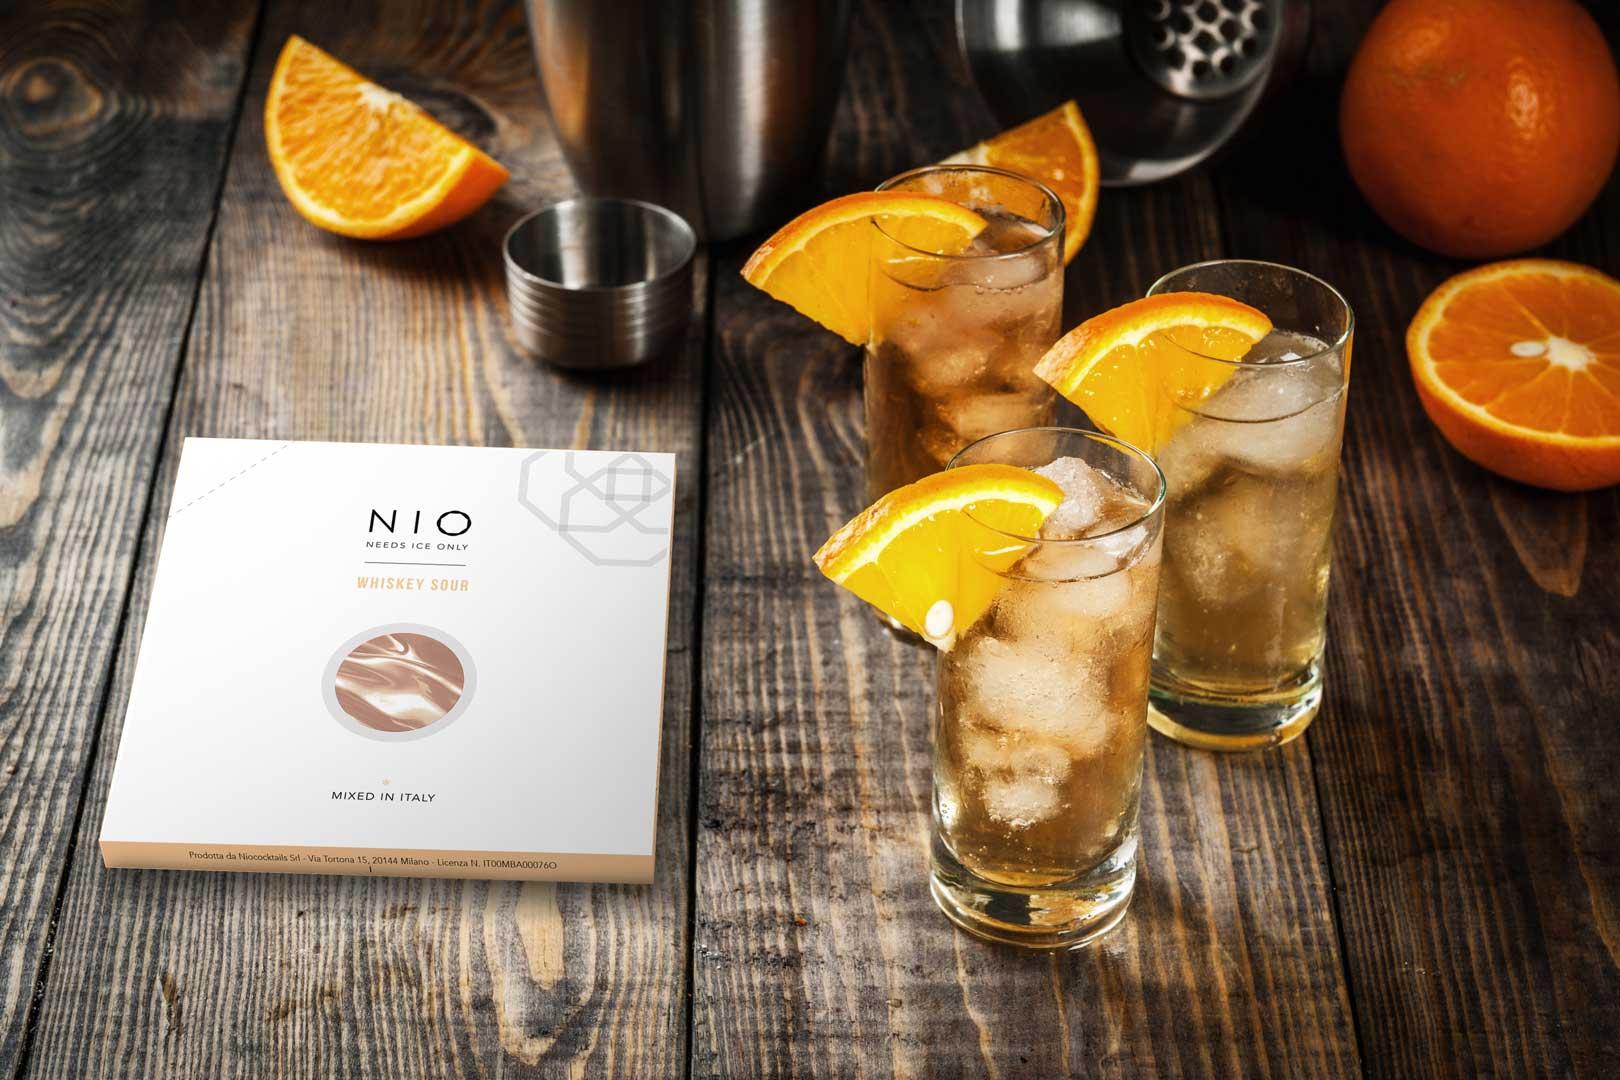 NIO – Needs Ice Only